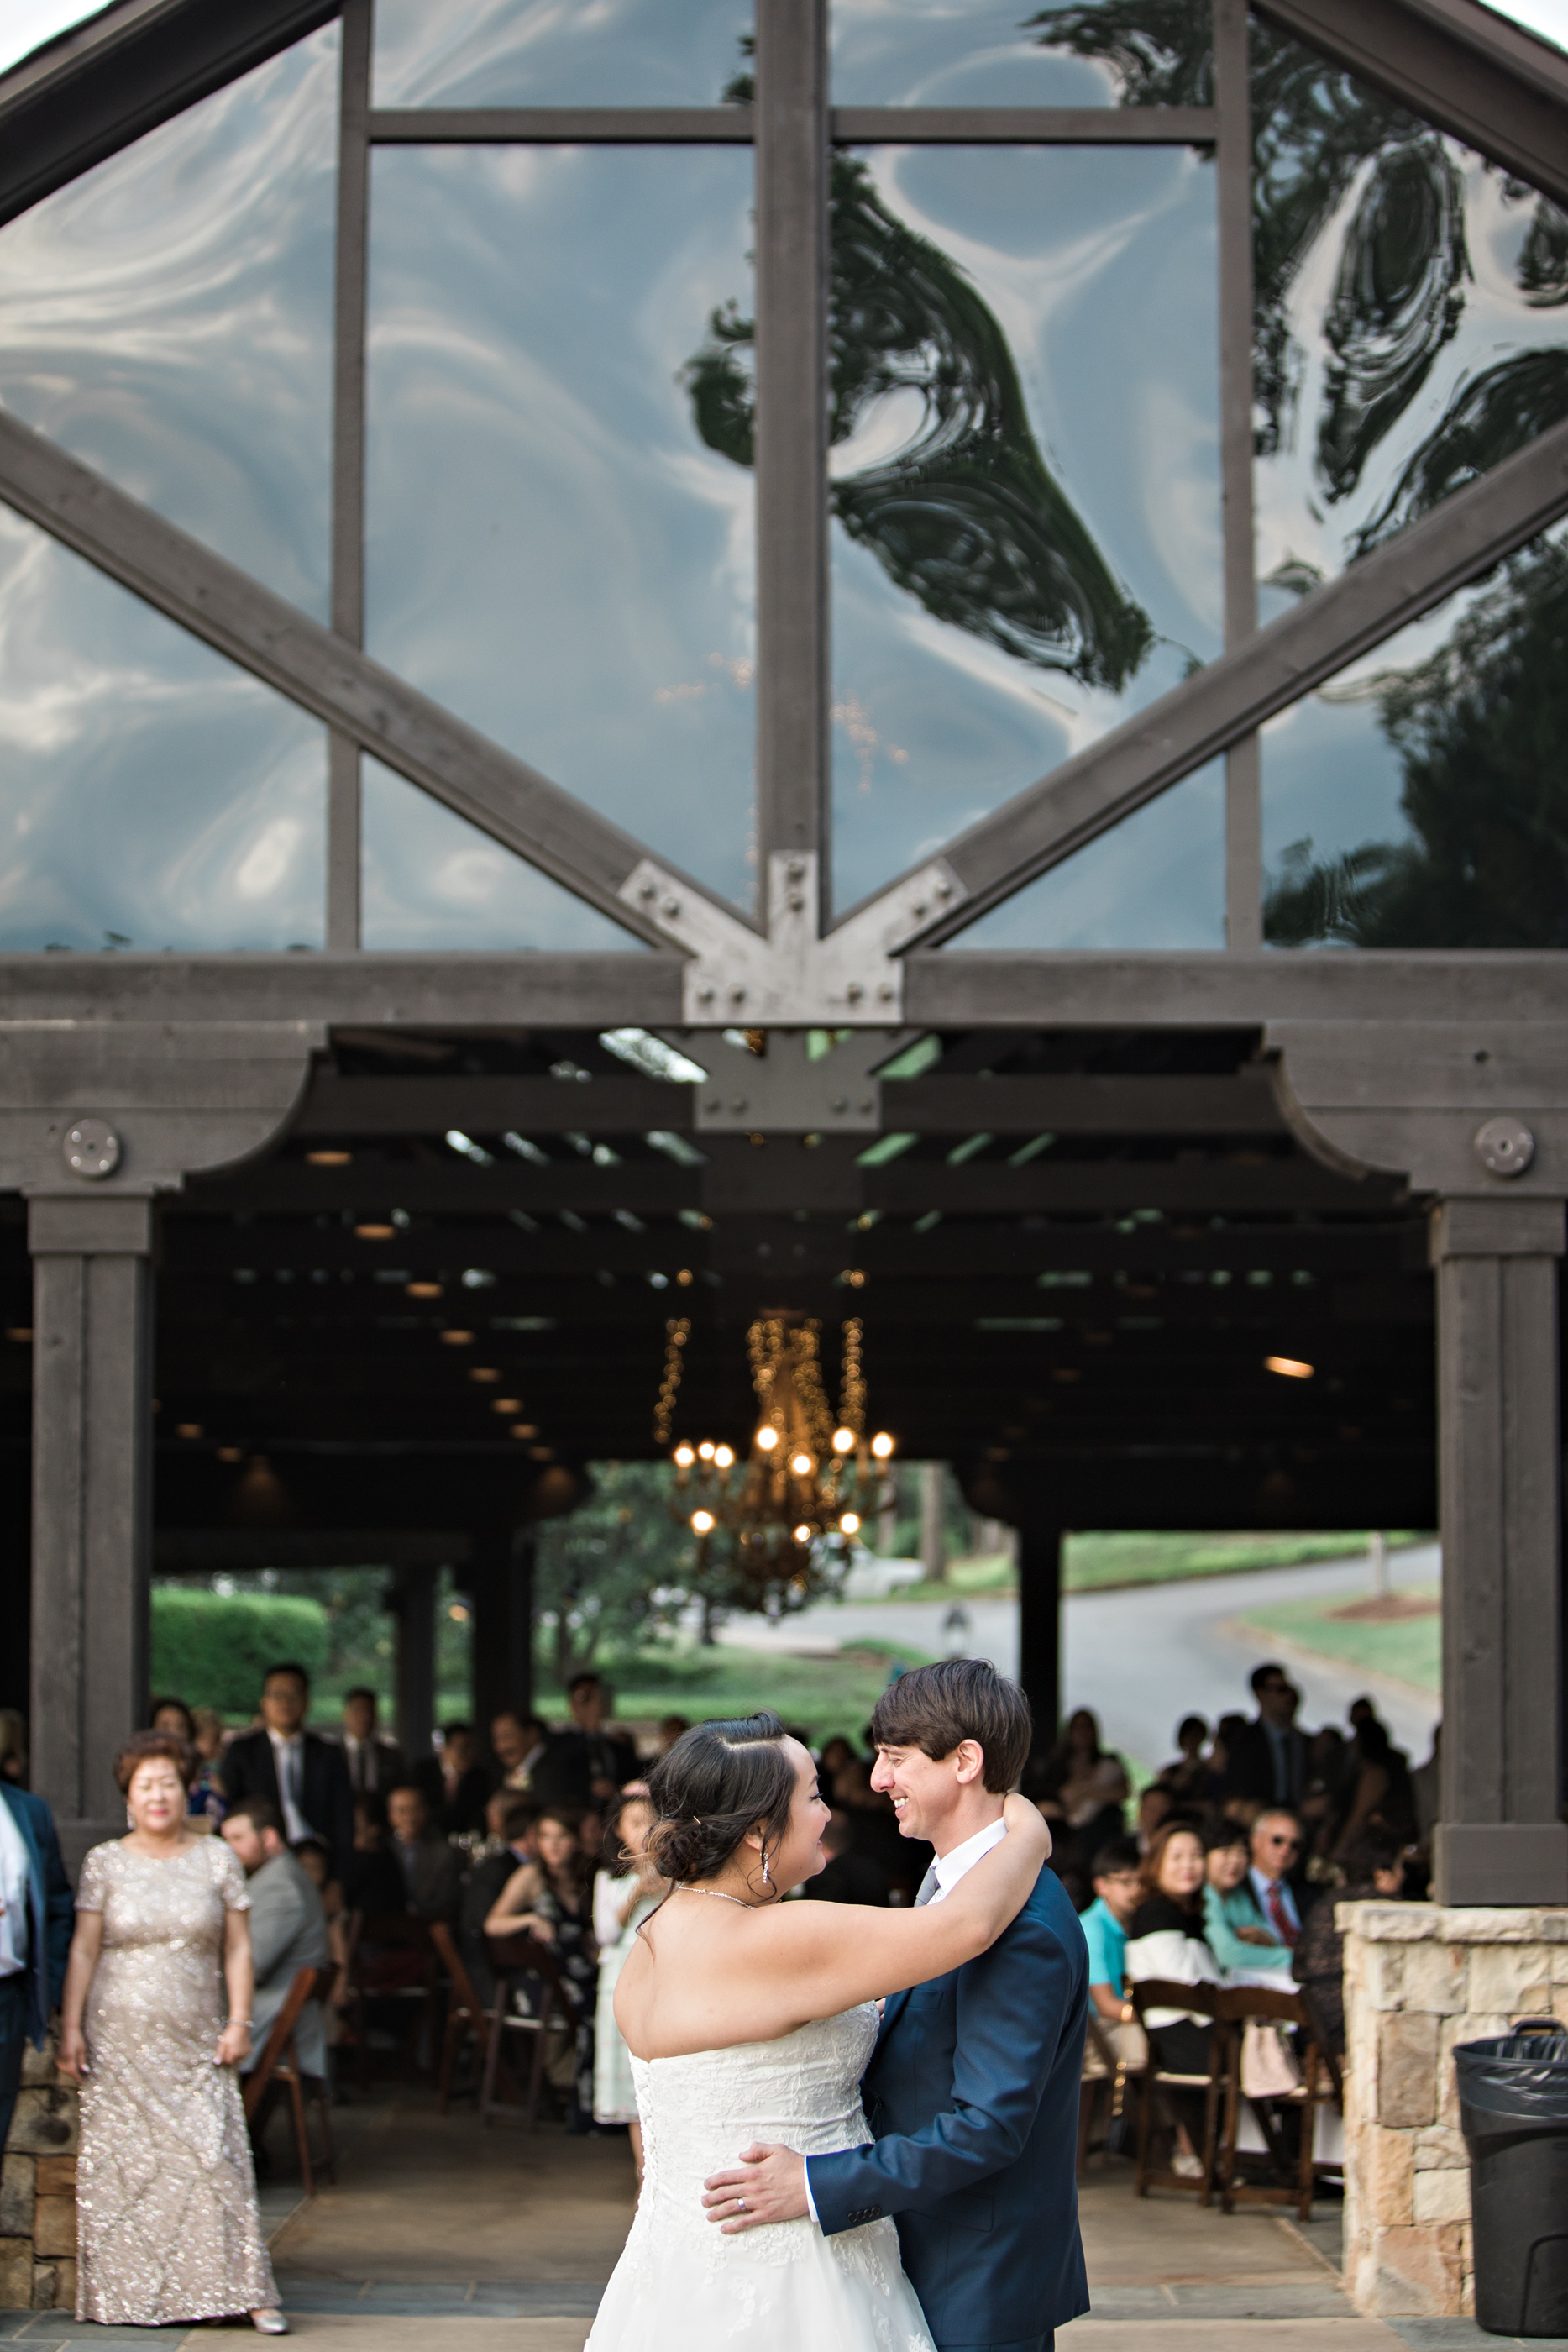 Ni ck-Drollette-Photography-Auburn-Alabama-Weddings-Sylvia-Kevin-162.jpg